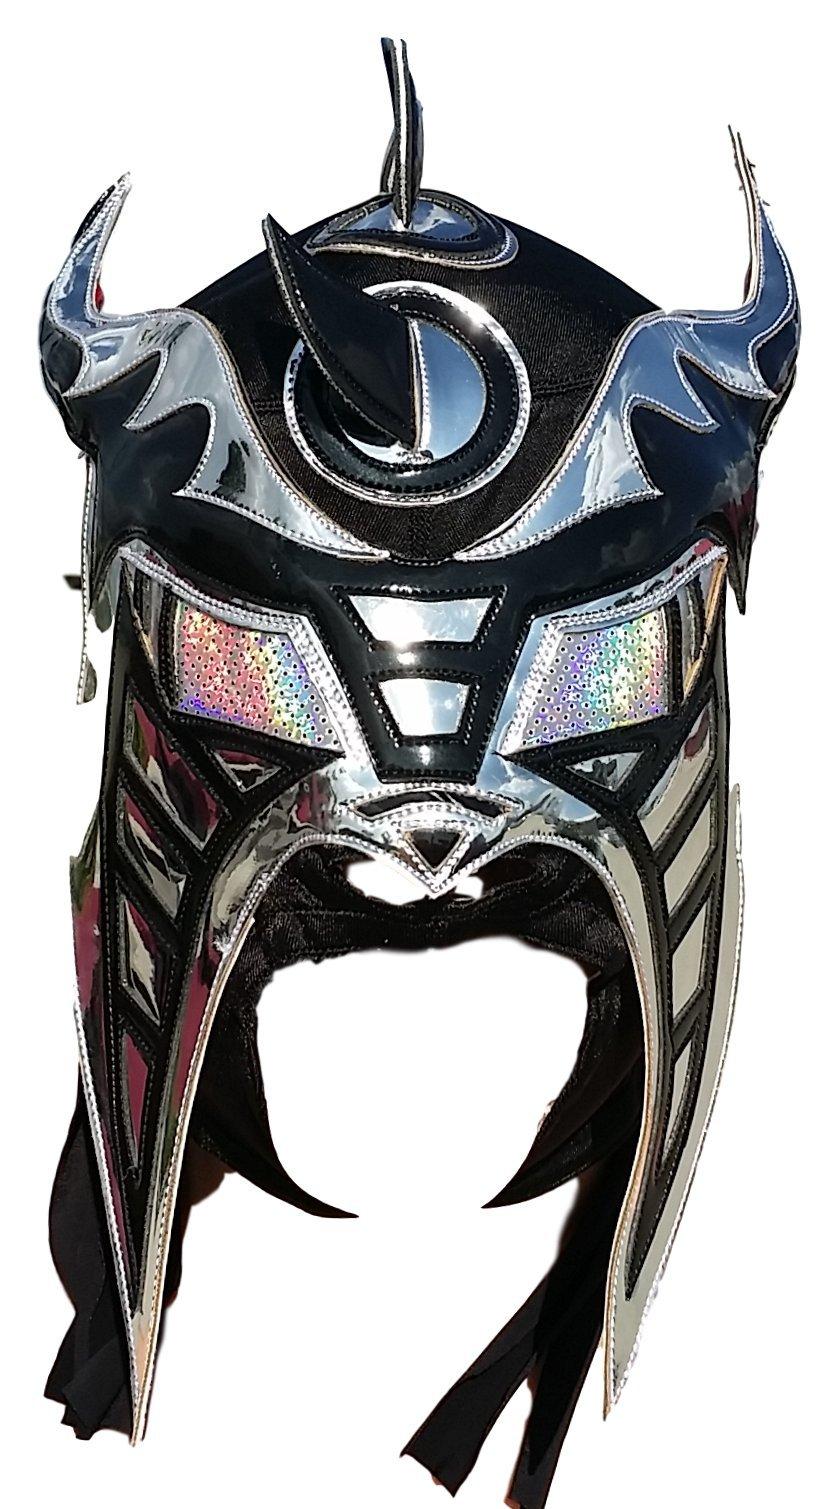 Hysteria Professional Lucha Libre Mask Adult Size Premium Quality (Black/Silver)